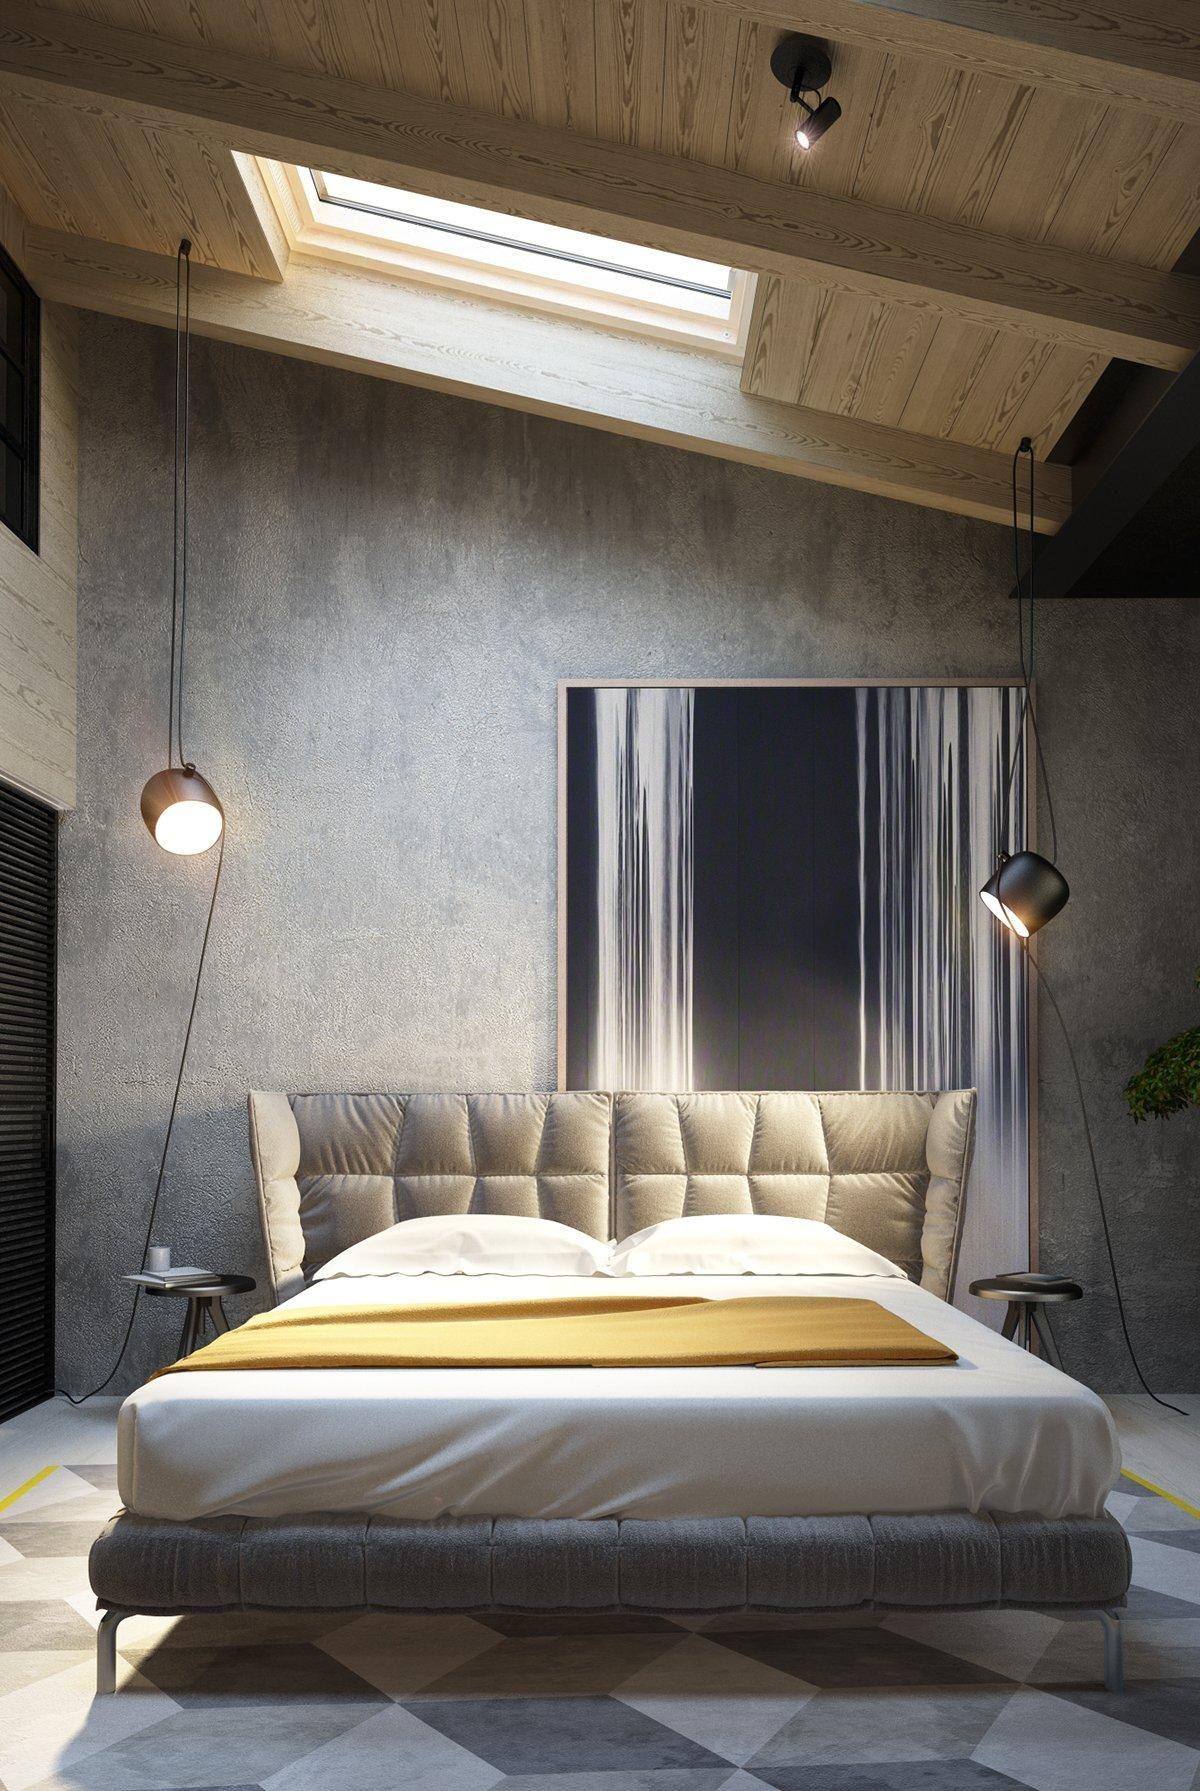 Exposed Concrete Walls Ideas Inspiration Concrete Bedroom Industrial Style Bedroom Bedroom Design